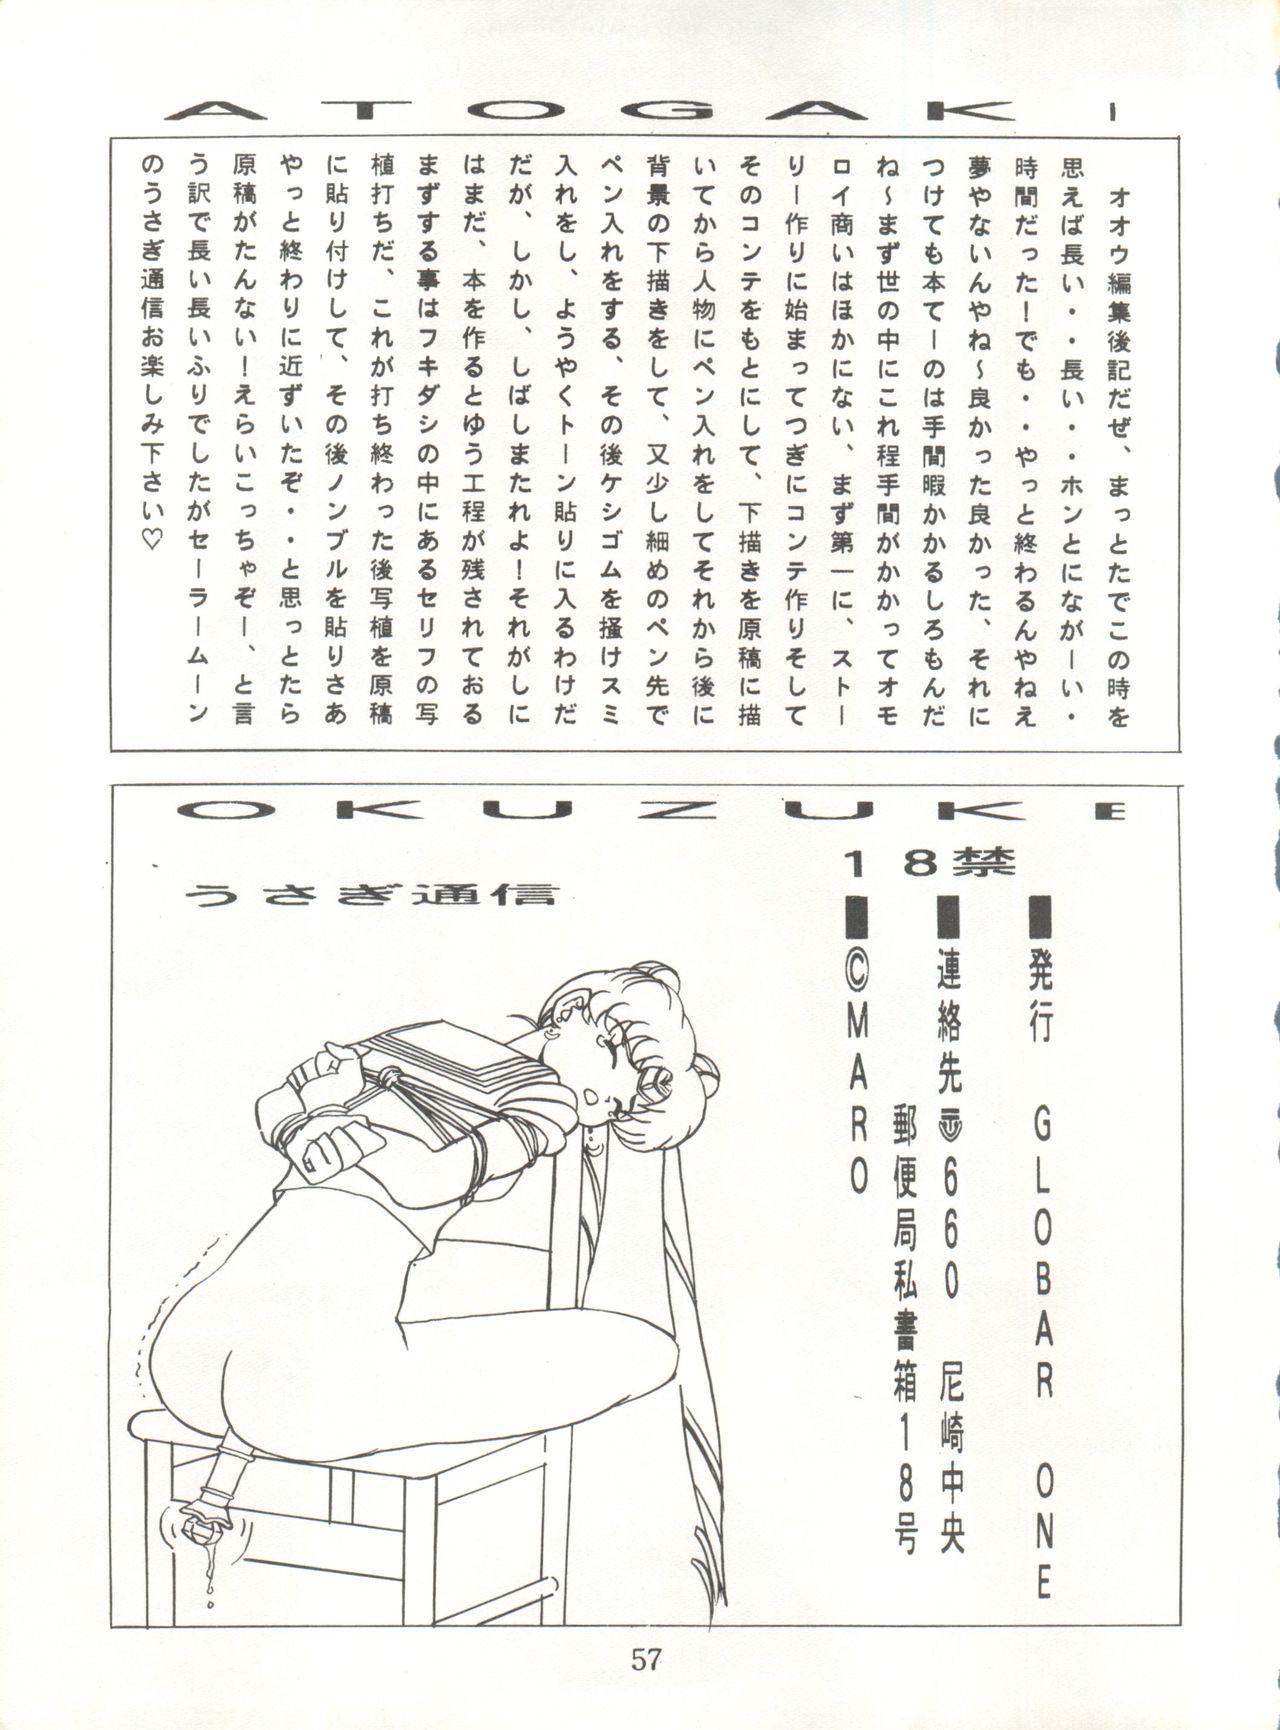 [Global One (MARO)] Sadistic 5 (Cutey Honey, Devilman, Sailor Moon), [Global One (MARO)] Sadistic (Dirty Pair, Fushigi no Umi no Nadia, Sailor Moon), [Studio Ikkatsumajin] .ribbon (Hime-chan's Ribbon) 116